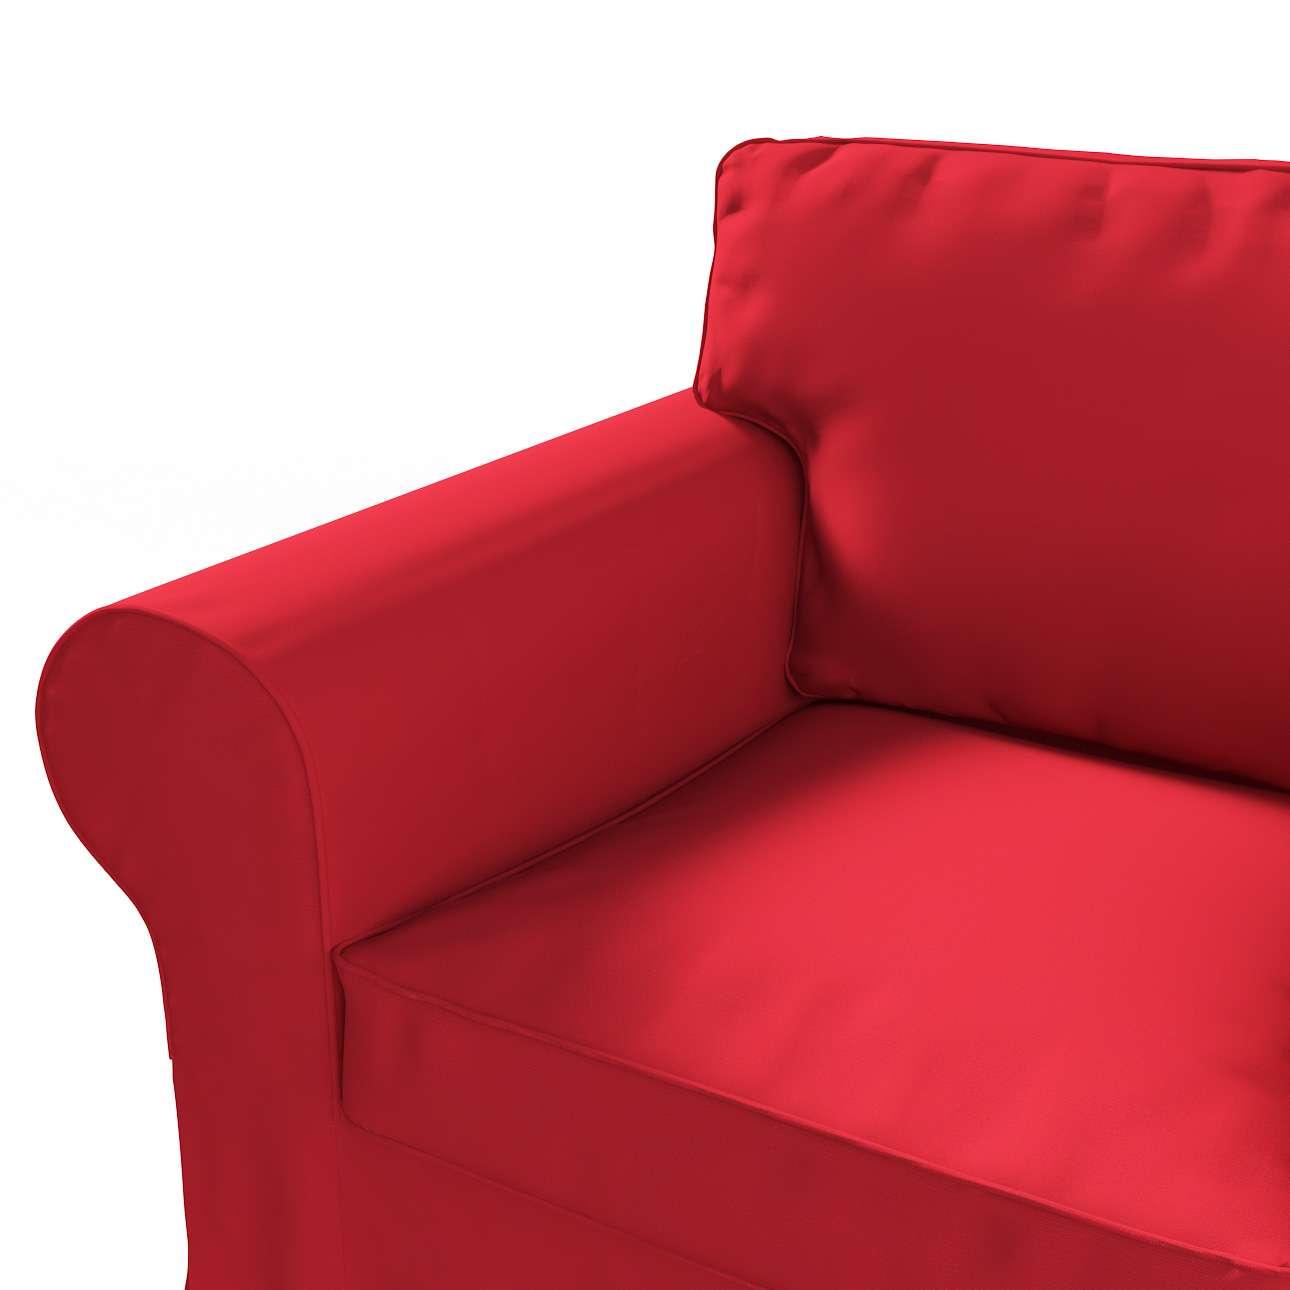 Ektorp Sesselbezug Sesselhusse, Ektorp Sessel von der Kollektion Cotton Panama, Stoff: 702-04